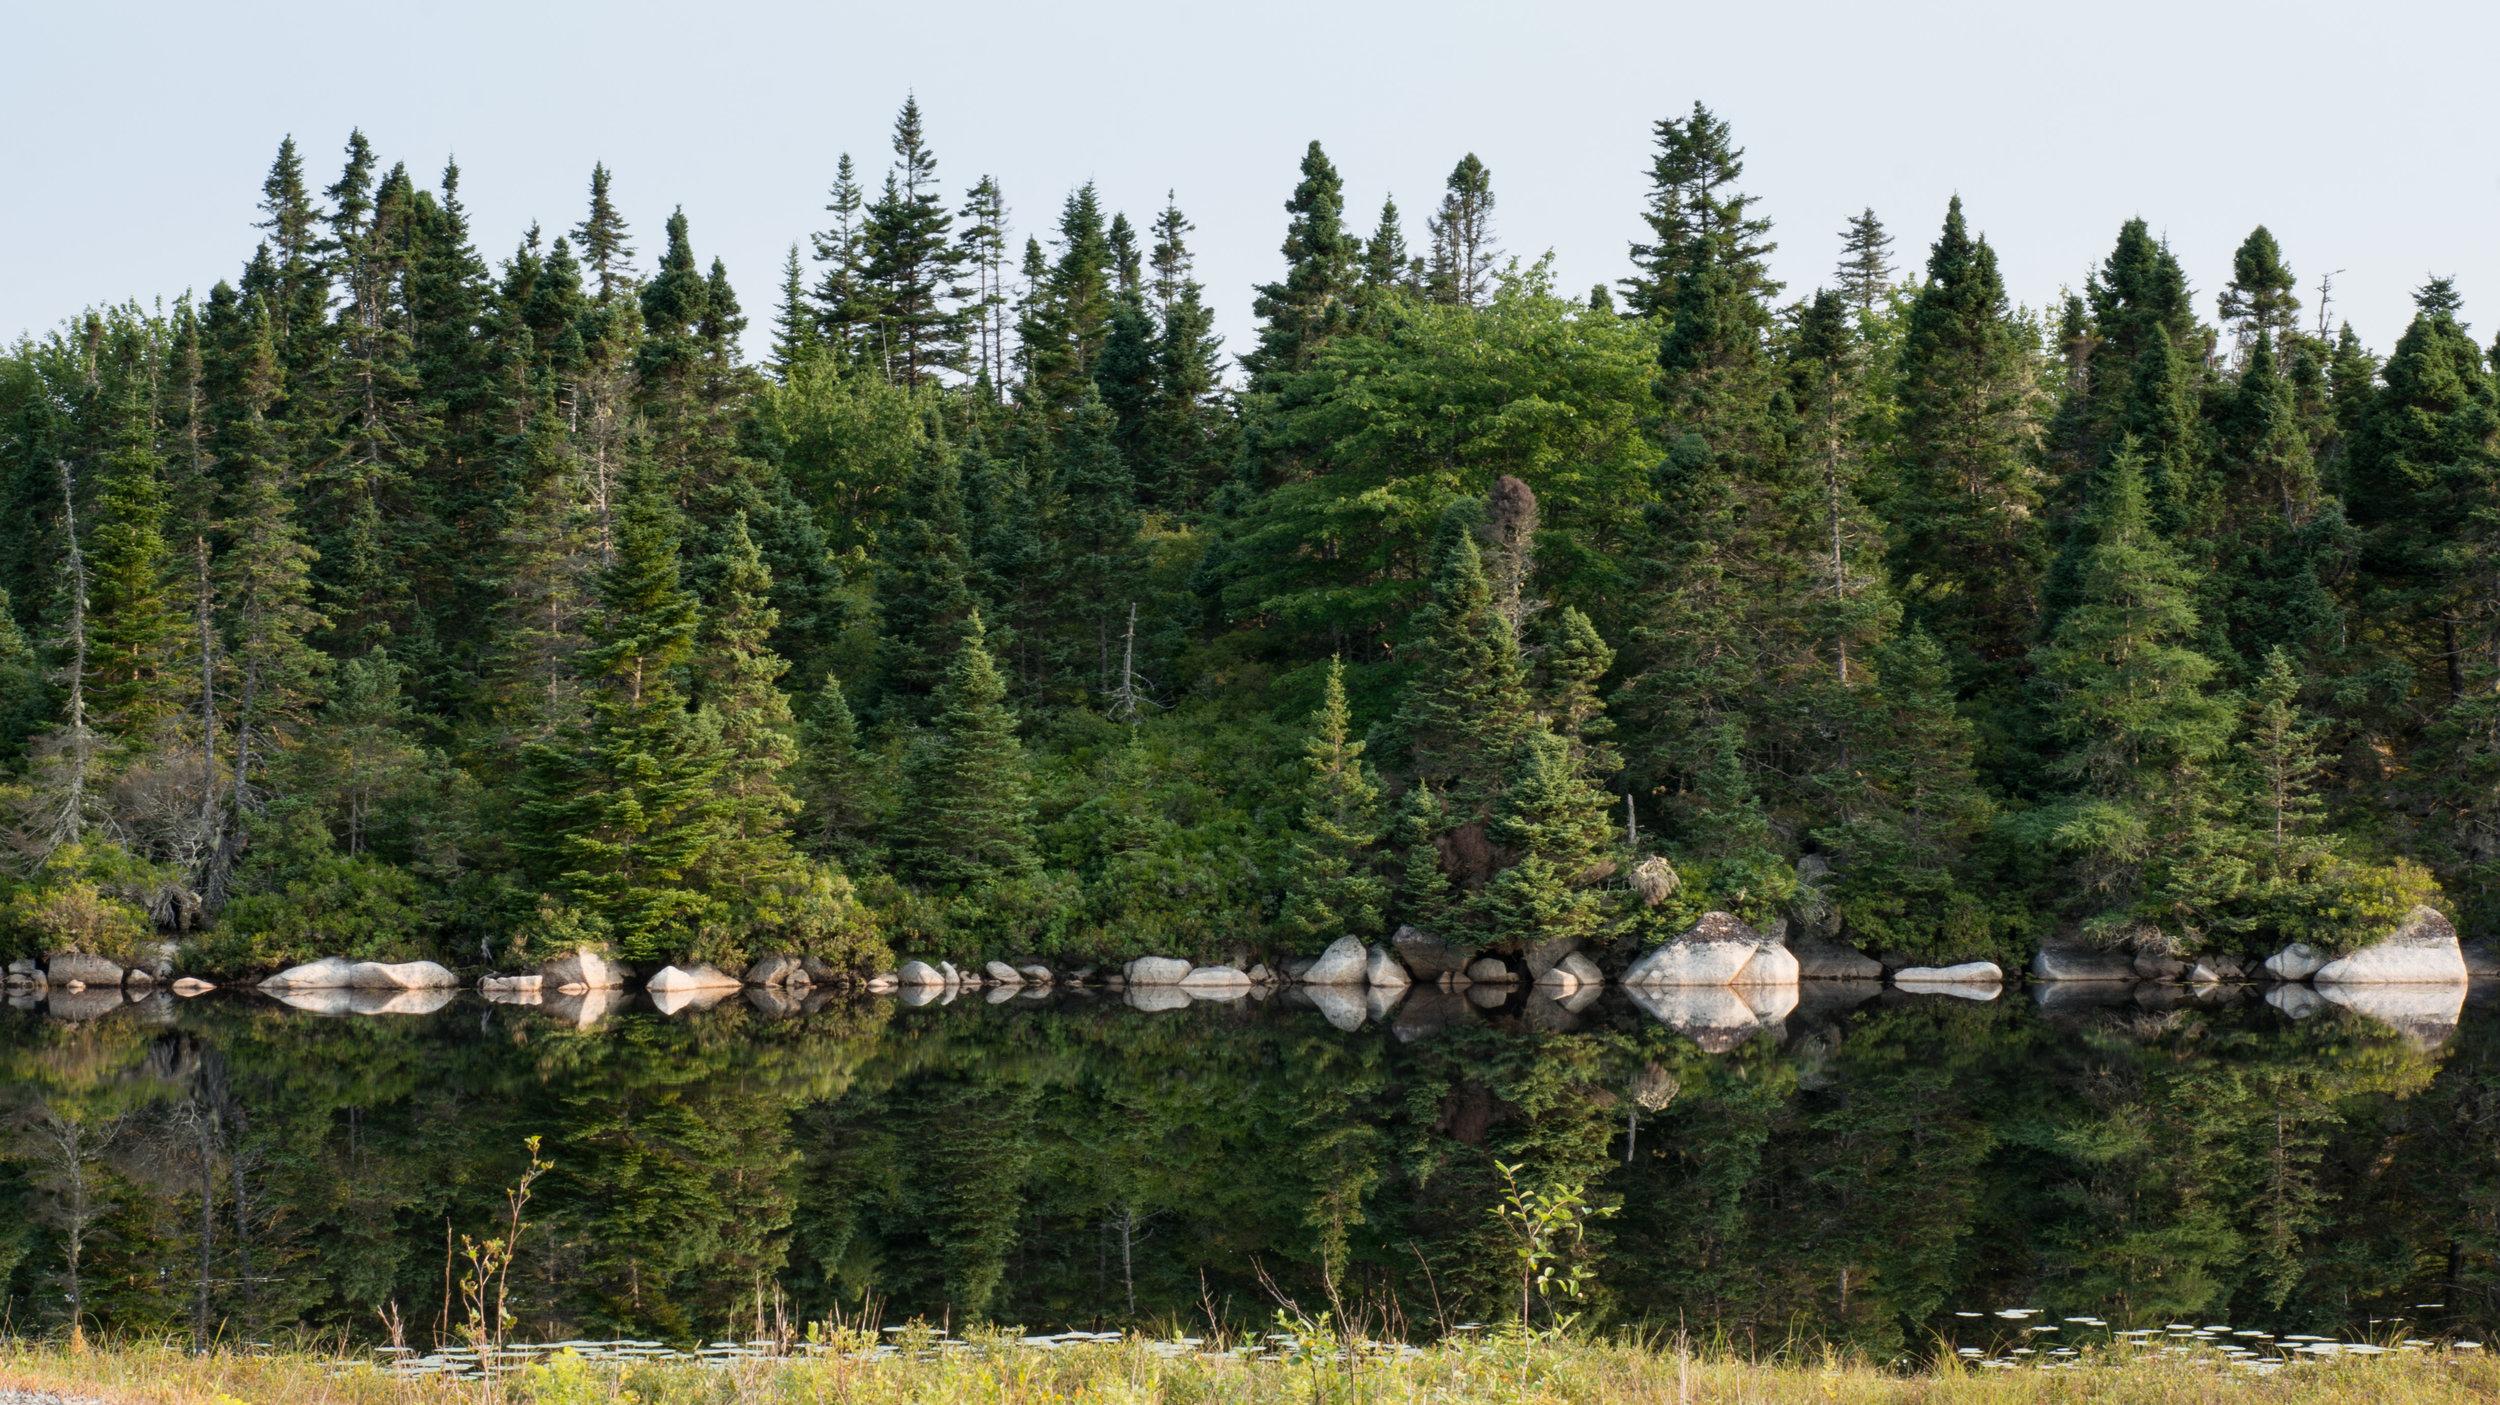 Lake near Peggys Cove, Nova Scotia.